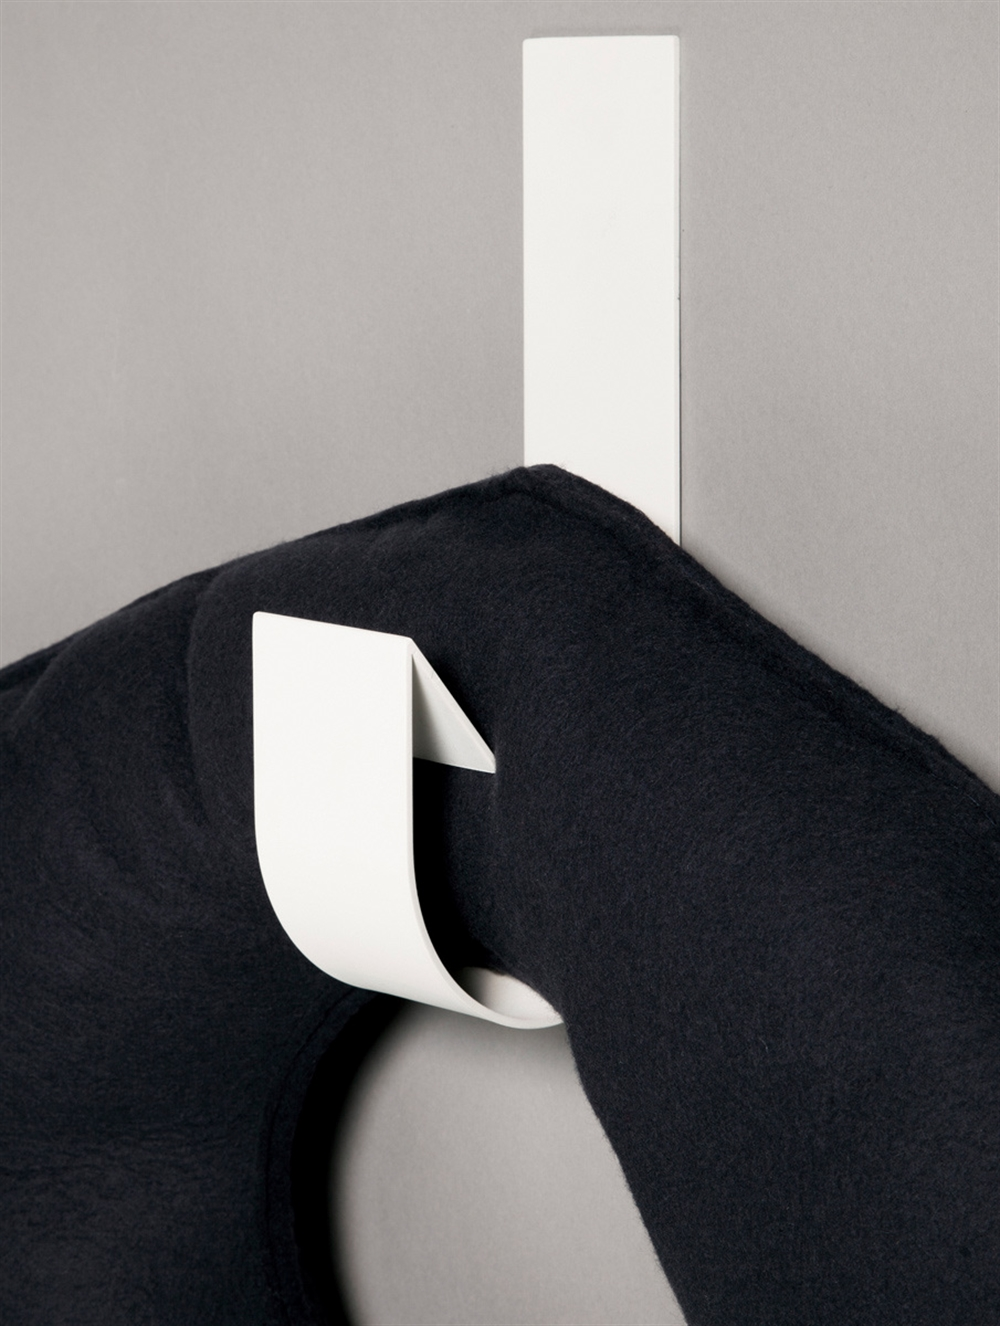 12 maija_puoskari_modern_finnish_design_home_decorating_ideas_scandinavian_style_forelements_blog